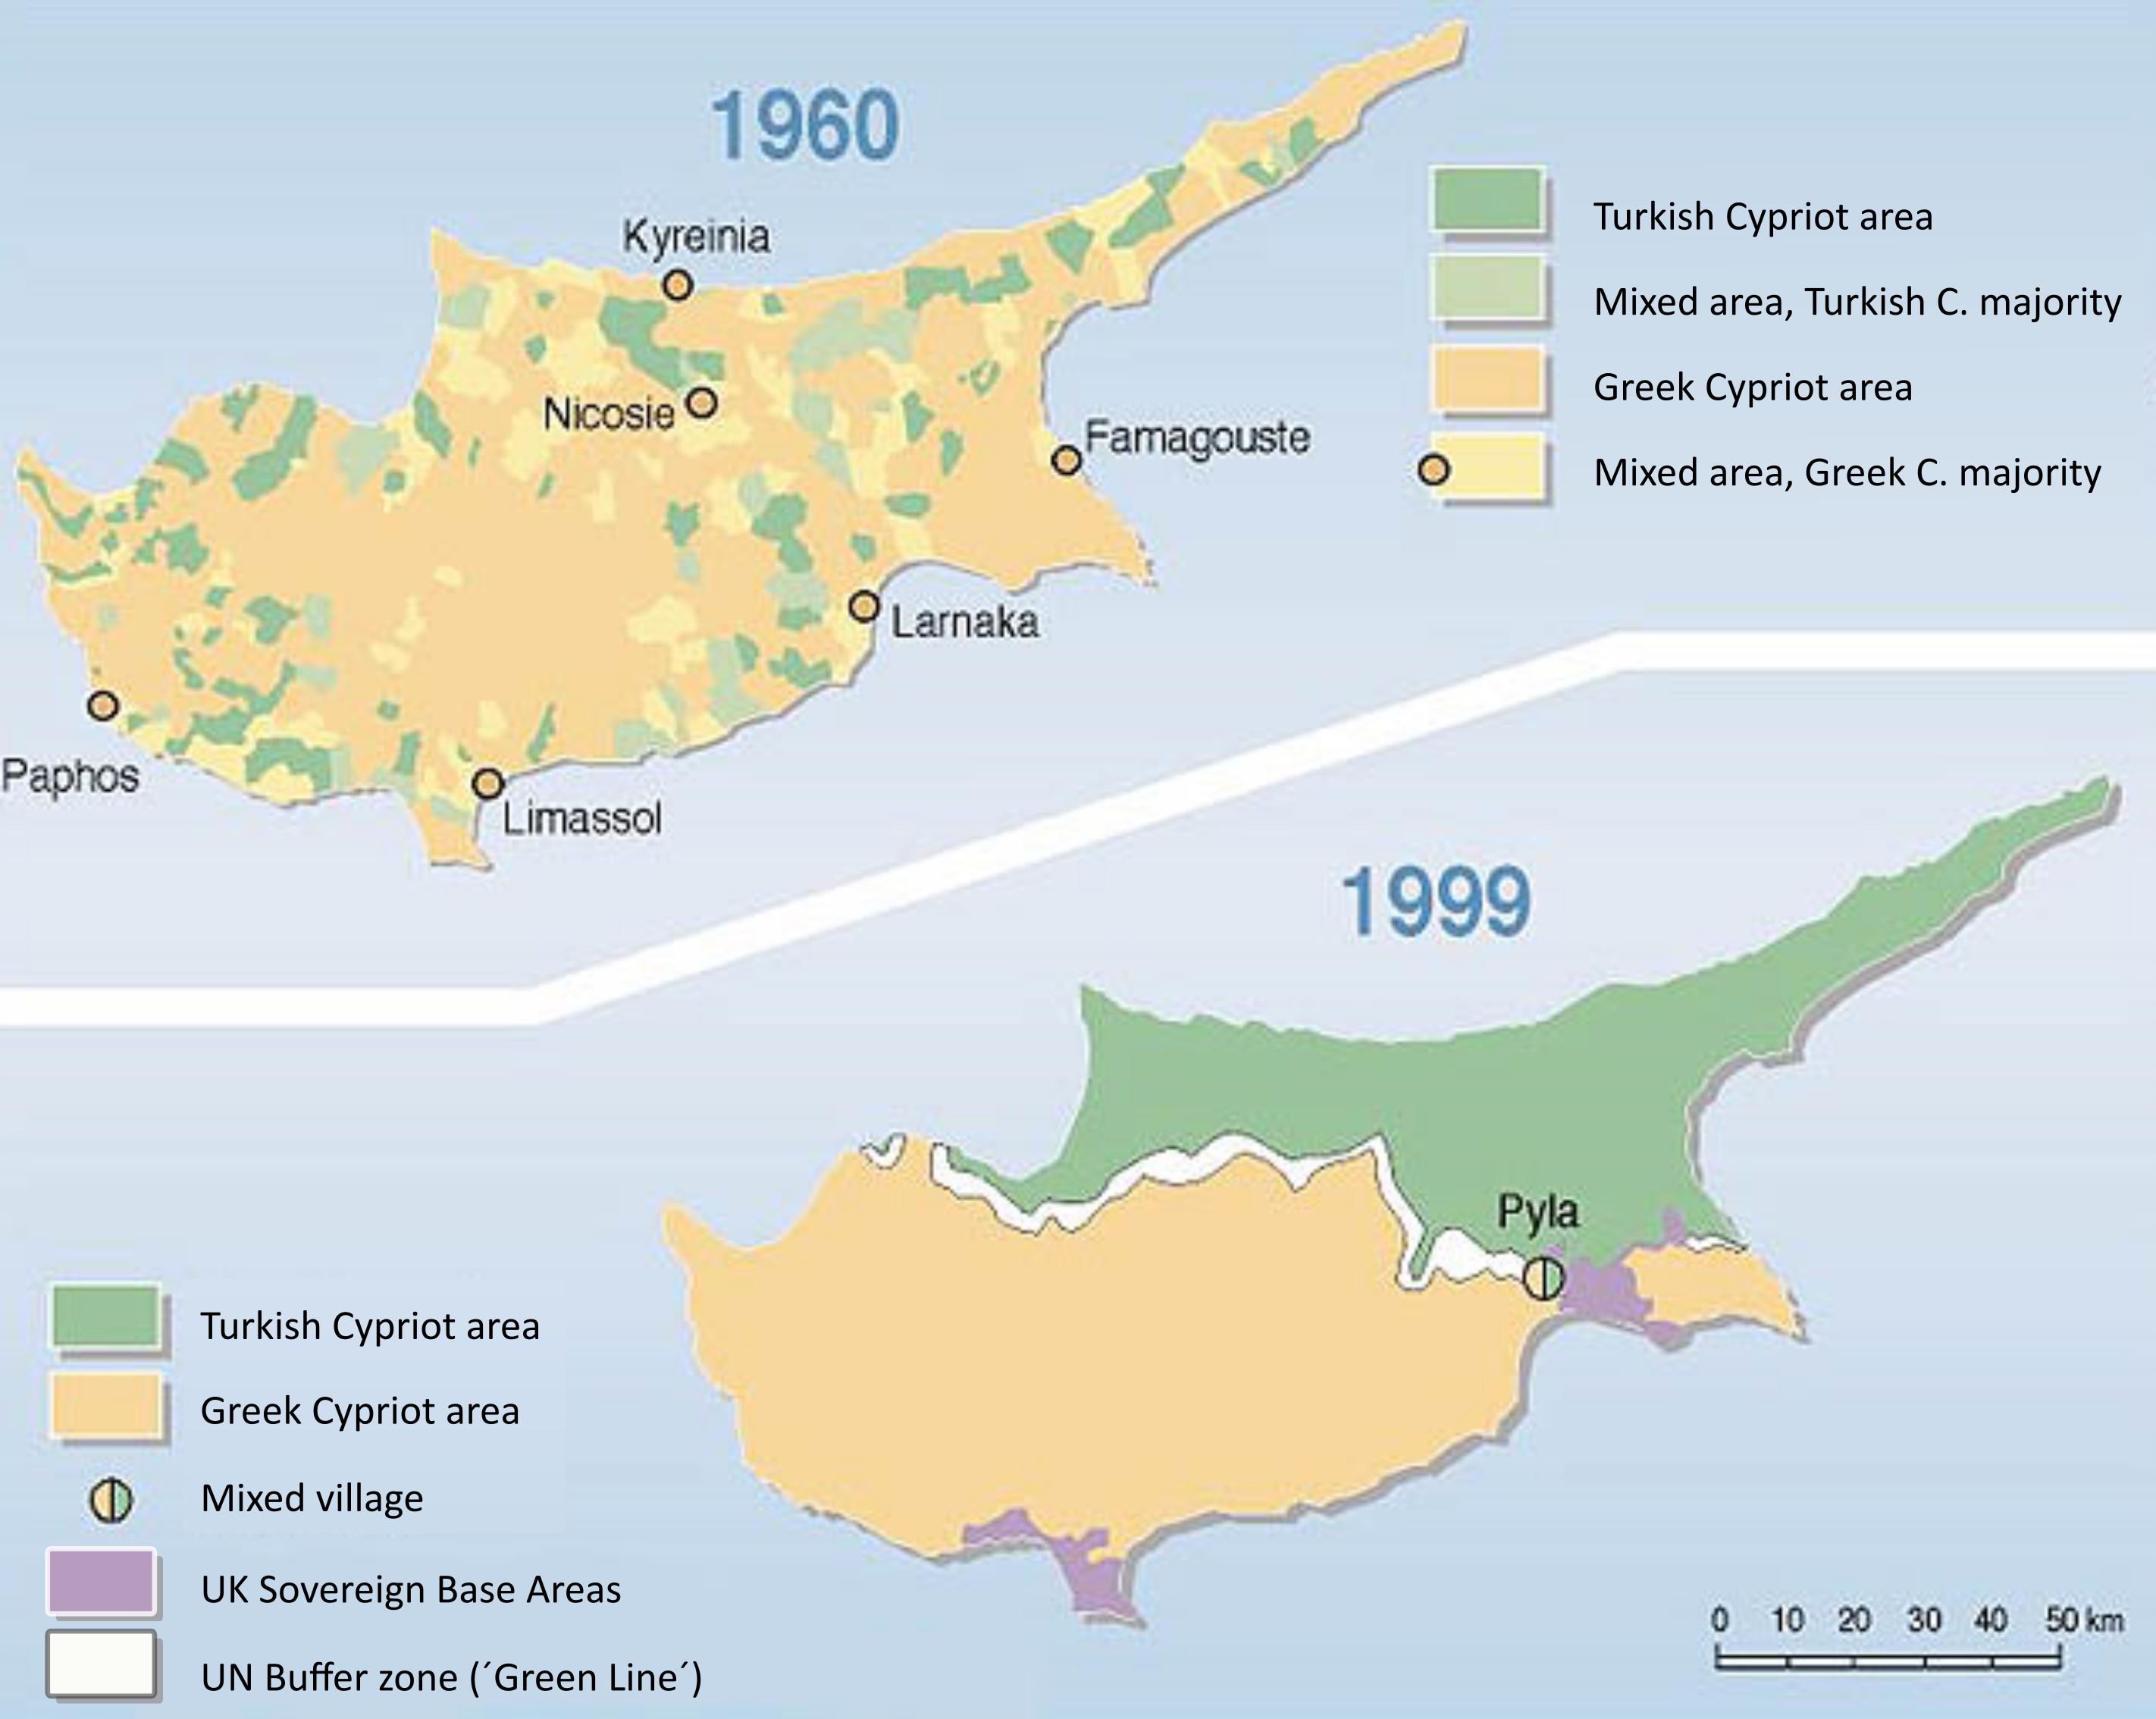 cyprus population distribution 1960 - 1999